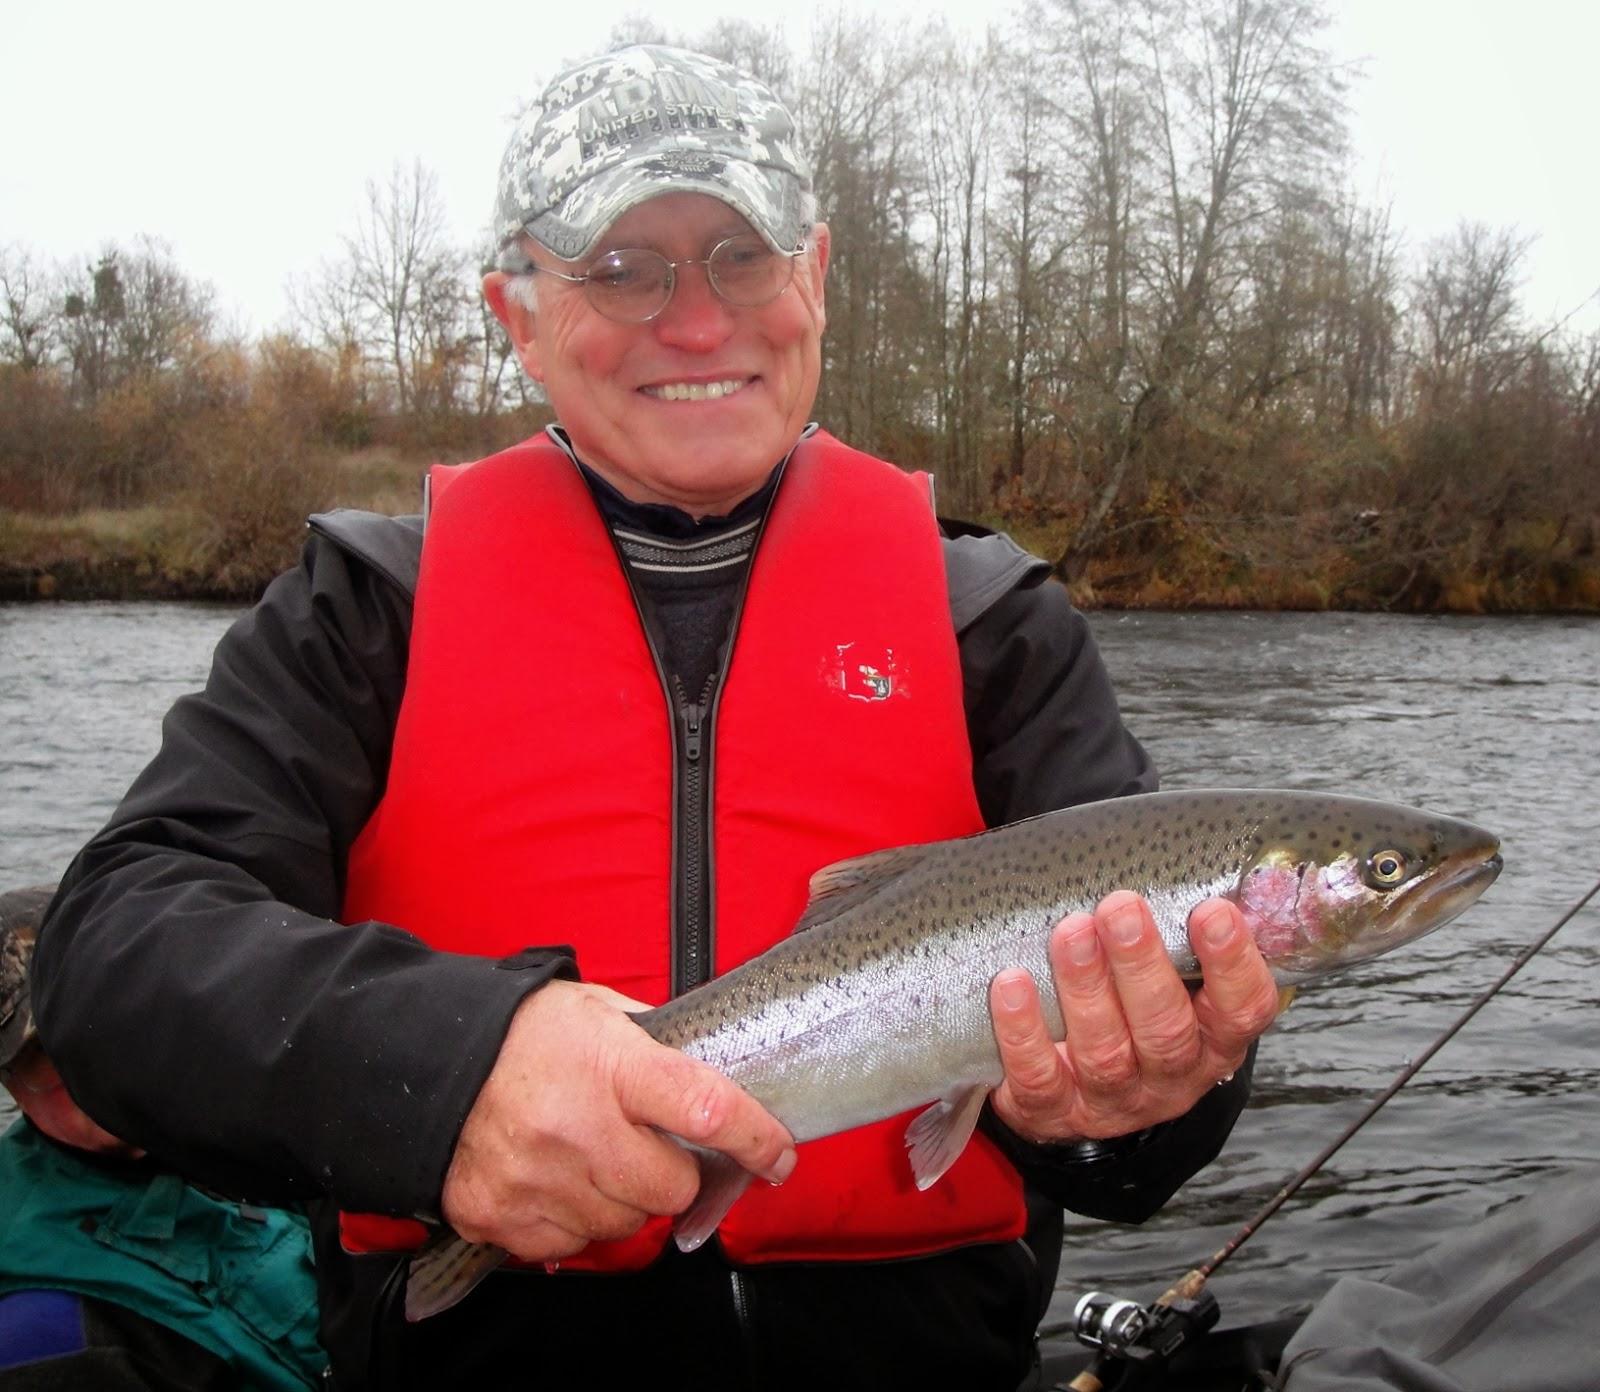 Rogue river steelhead fishing report rogue river fishing for Rogue river fishing report